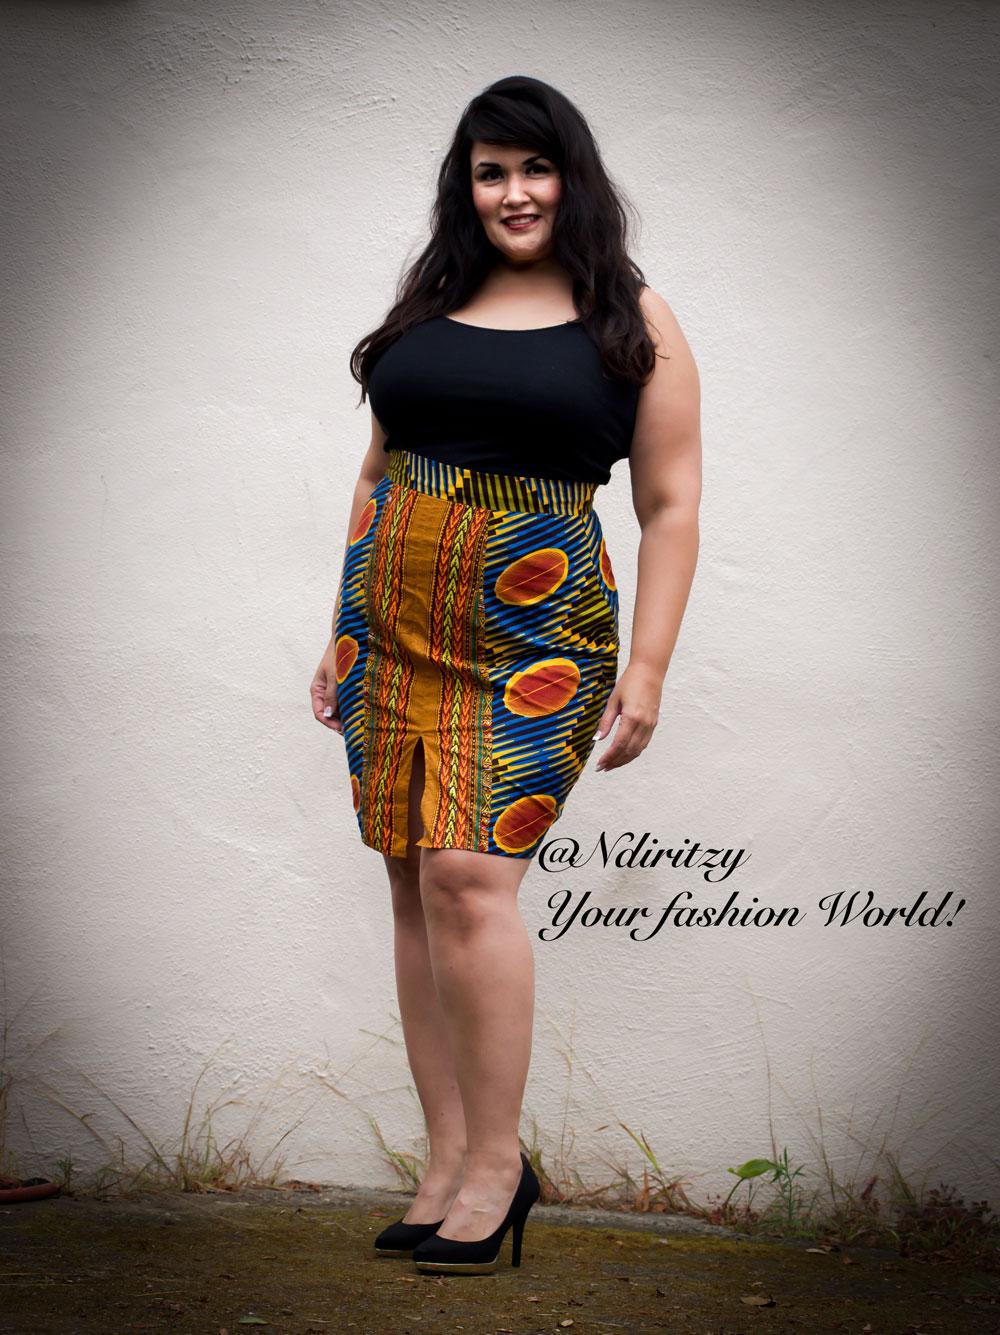 53696aa9daeae African print pencil skirt - NdiRitzy